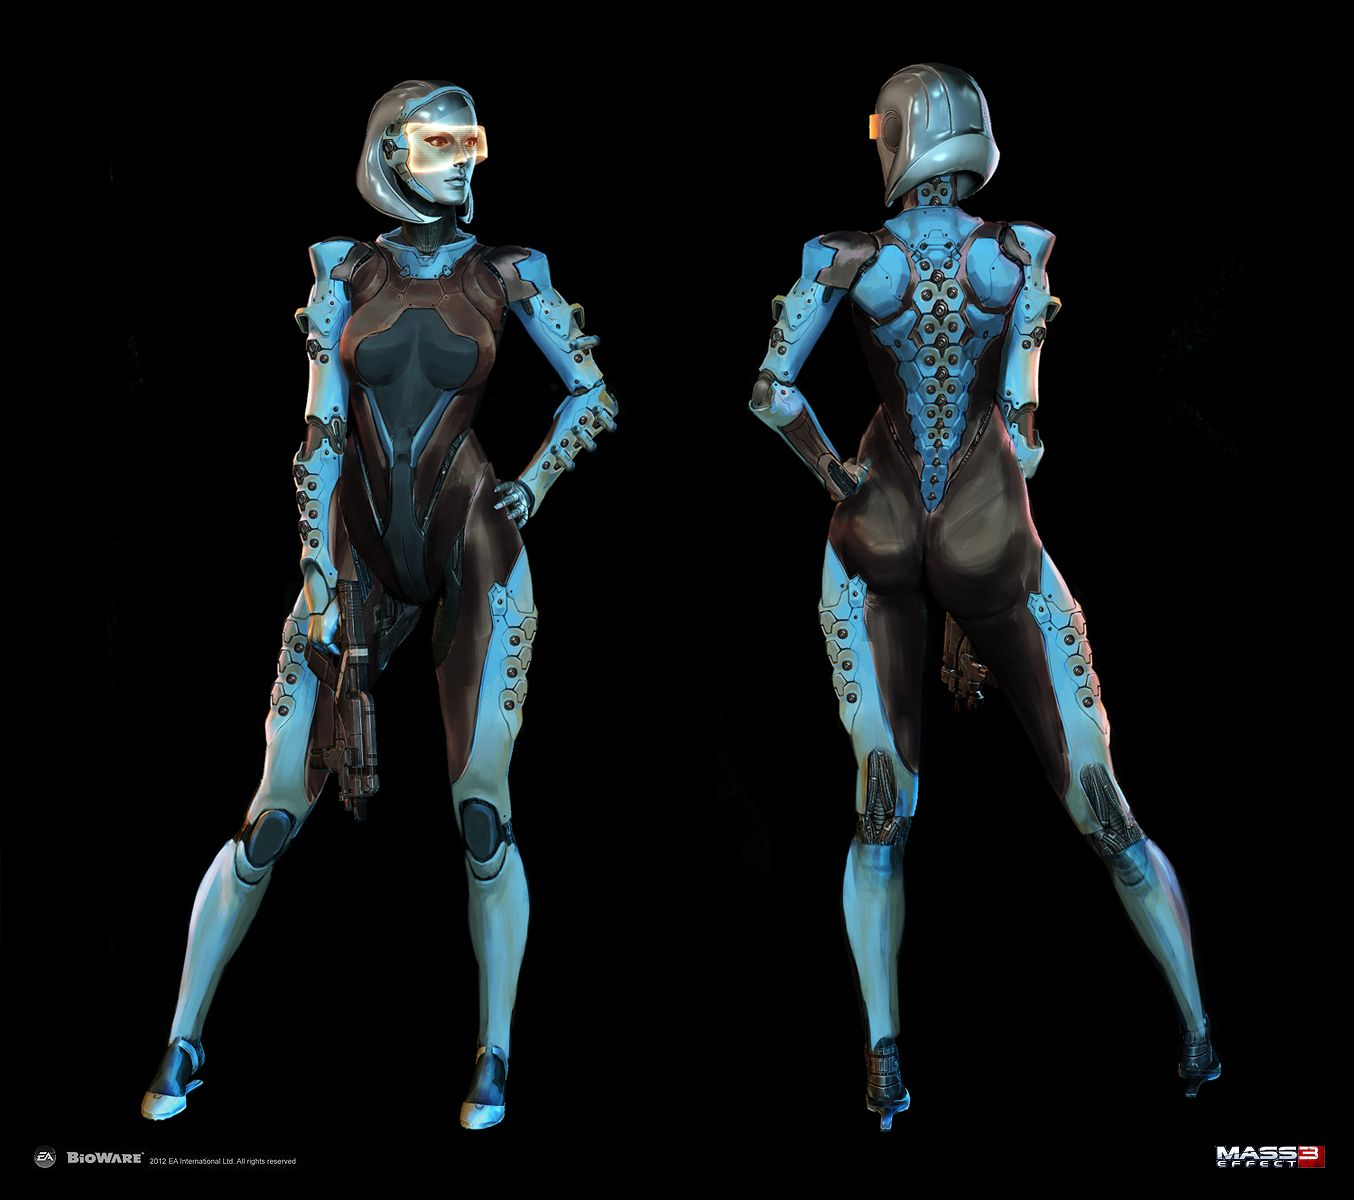 ArtStation - Mass Effect 3 - DLC Edi Alt appearance, Alex Figini